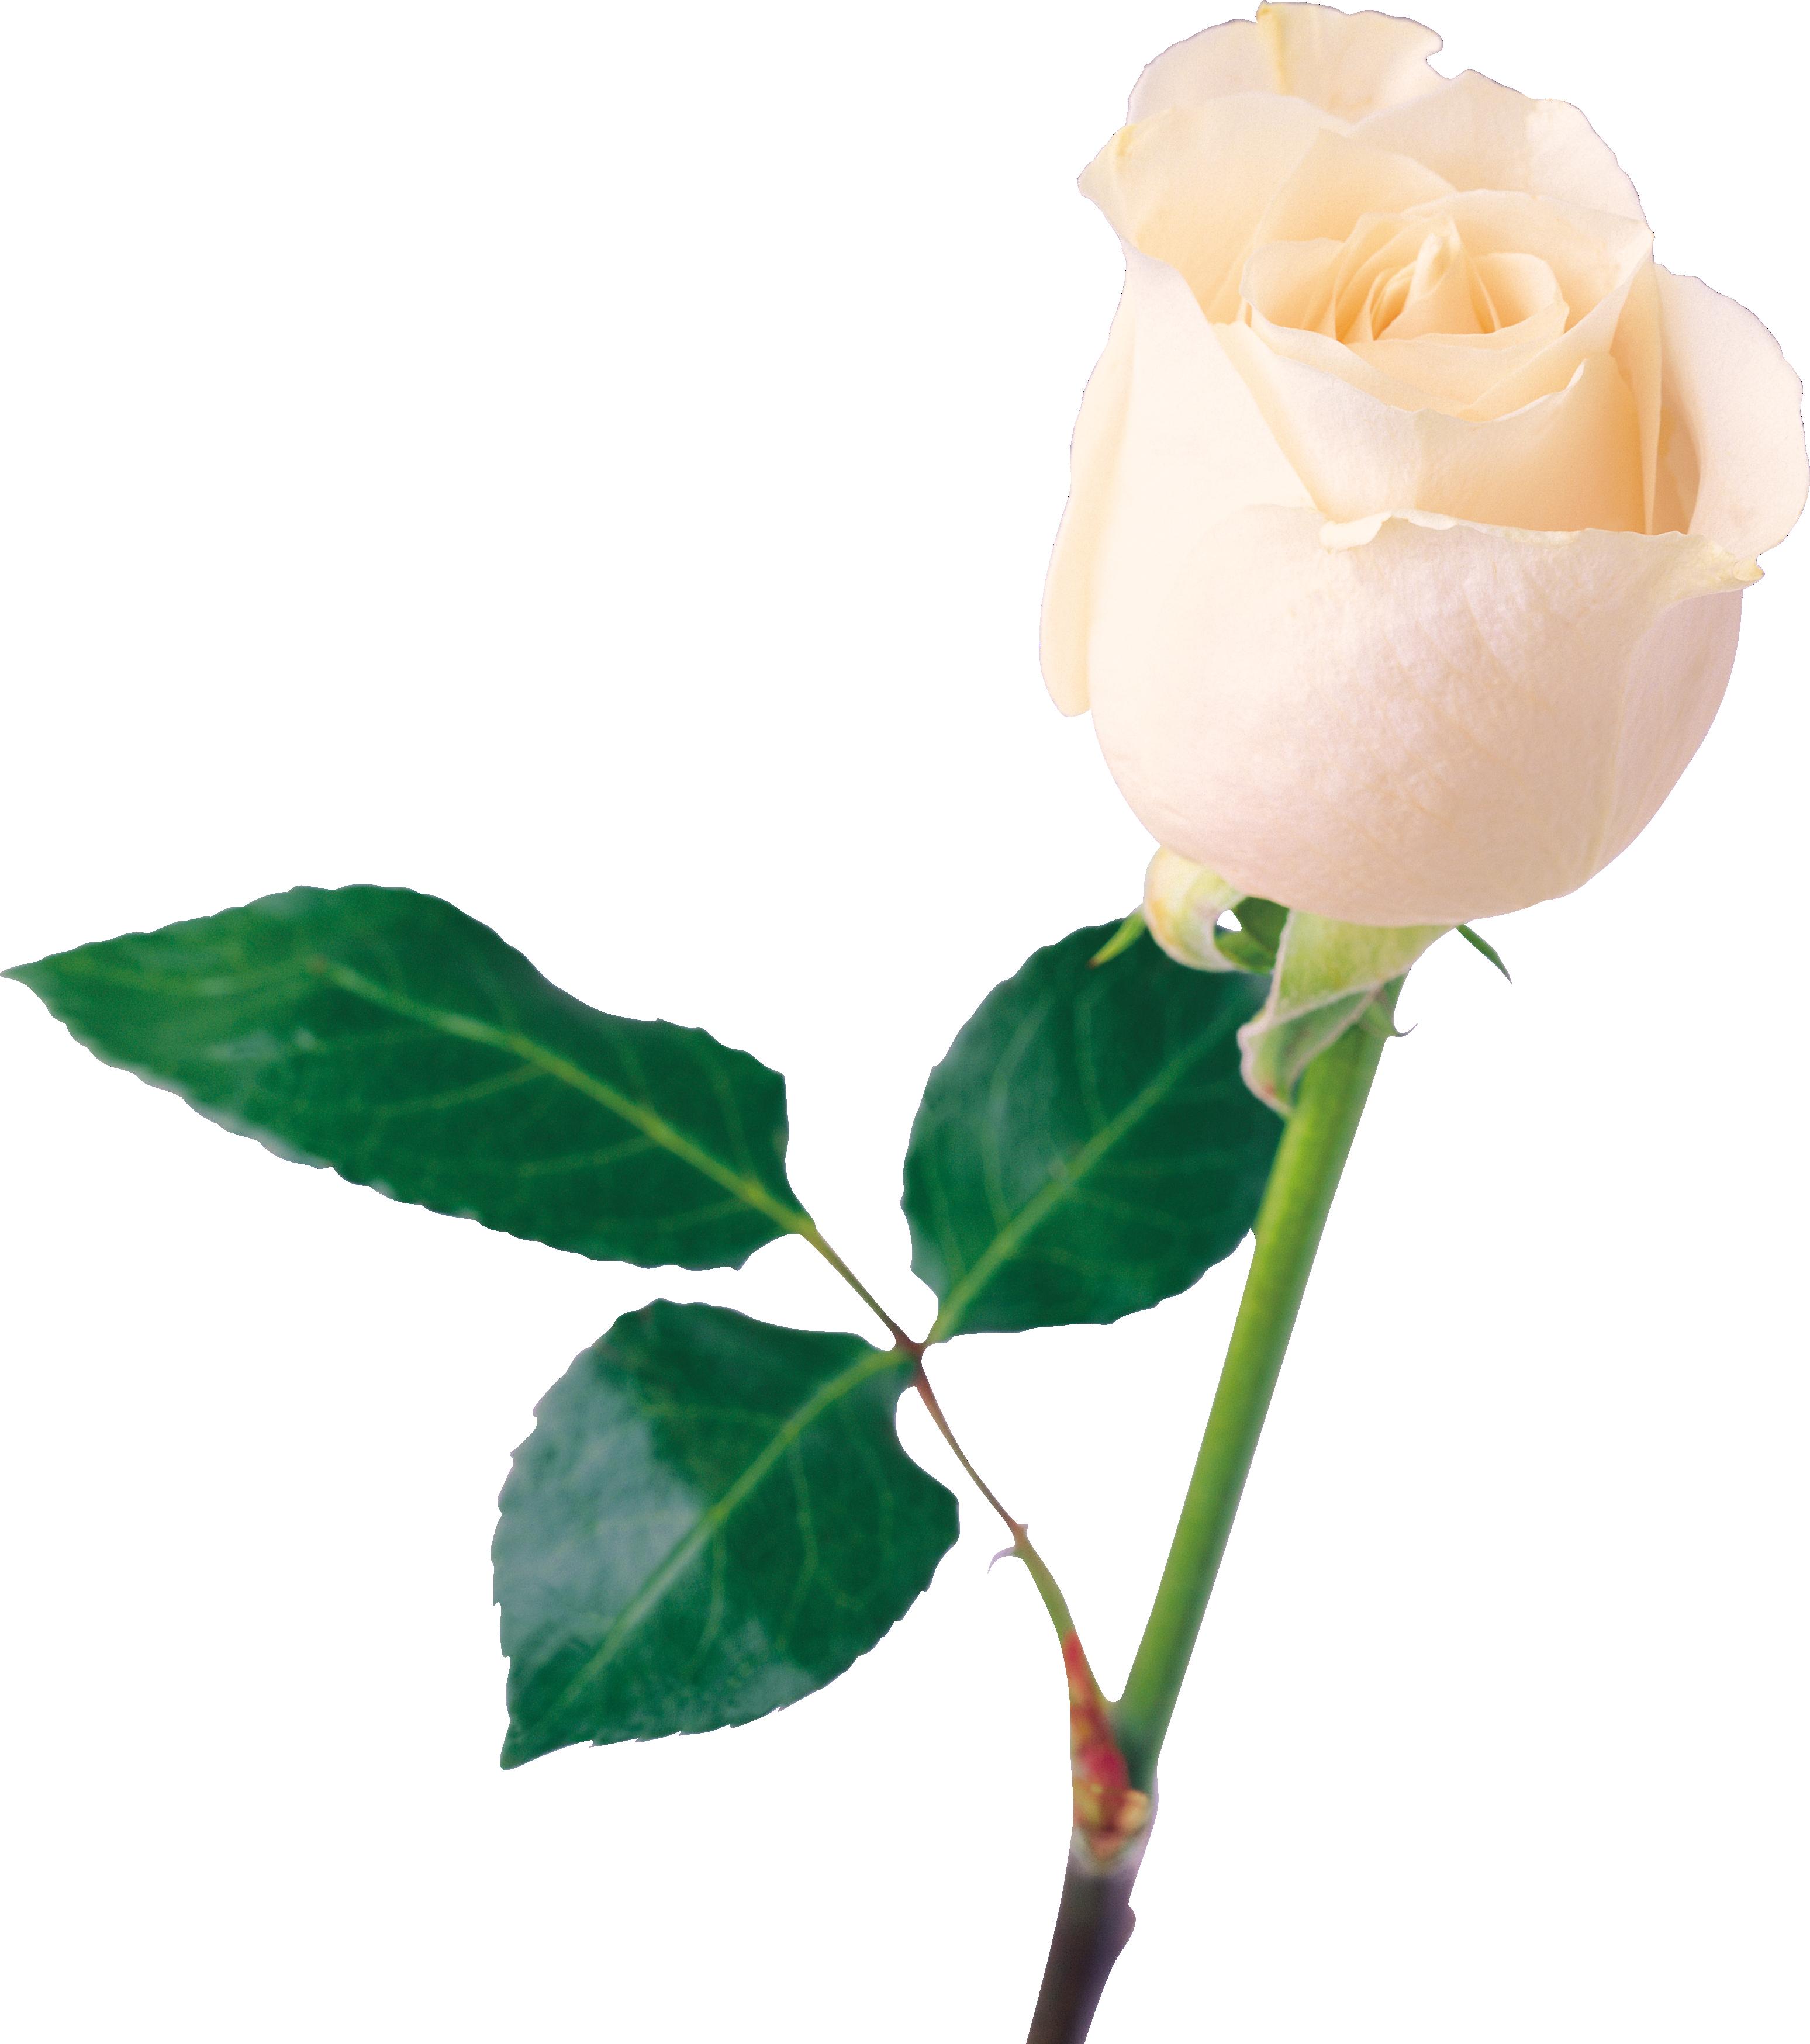 Clipart rose chalkboard. White png image flower